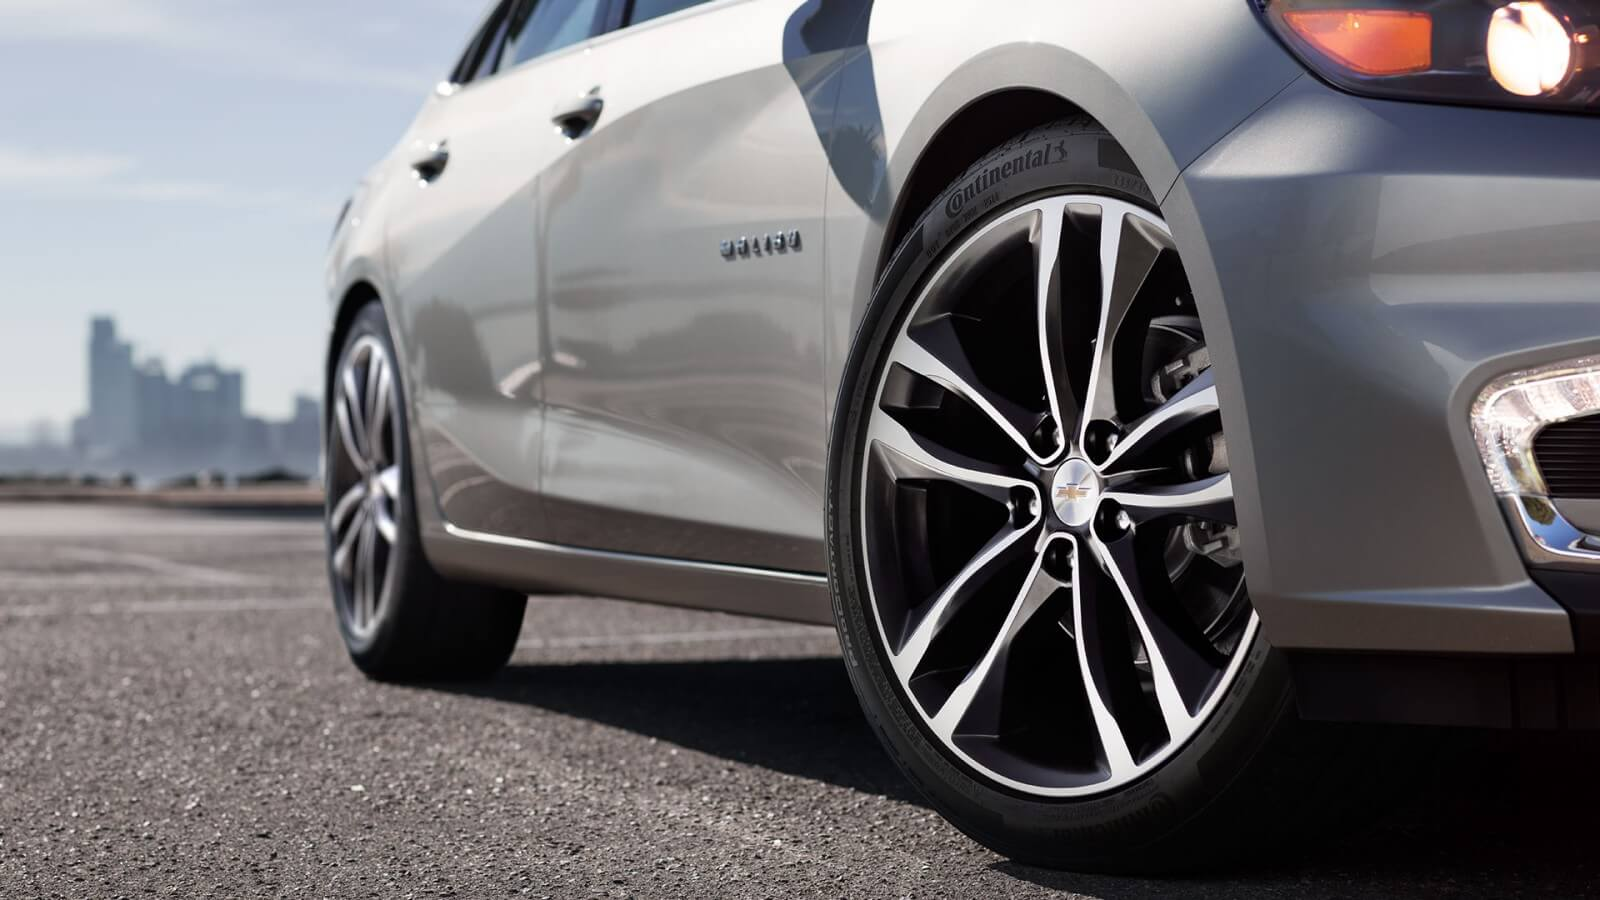 2016 Chevy Malibu wheels